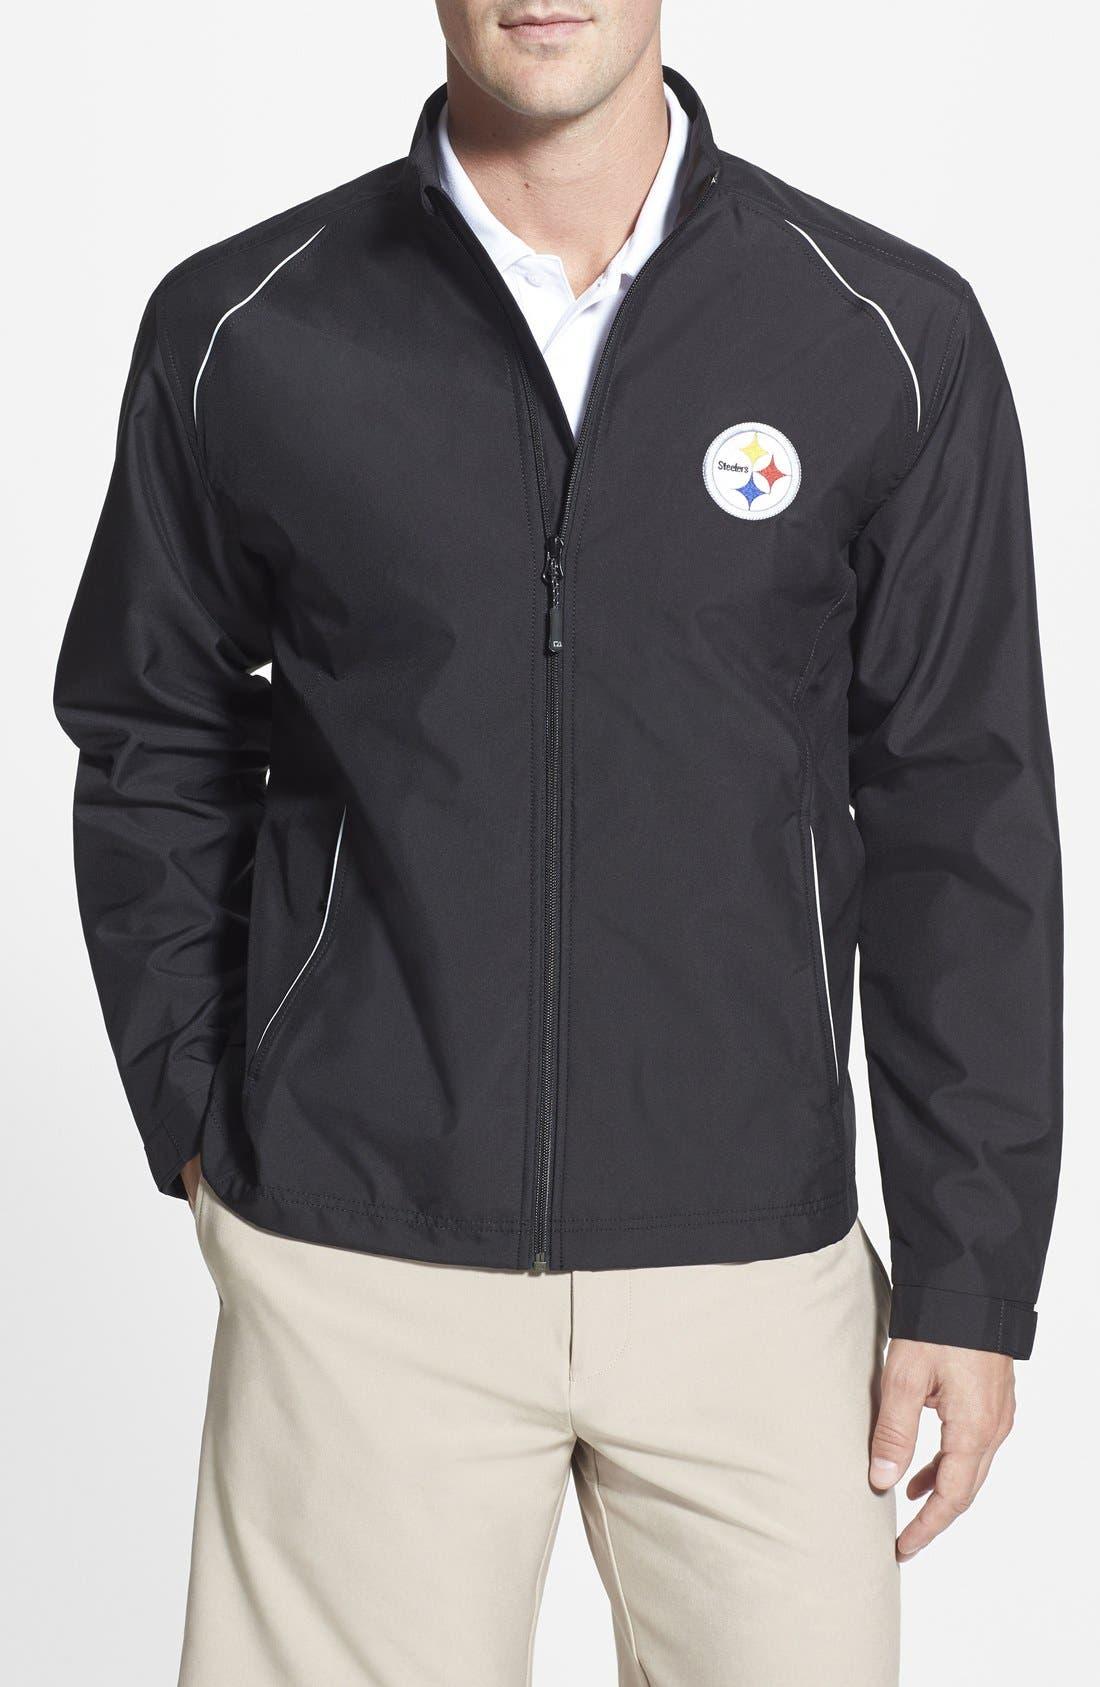 Pittsburgh Steelers - Beacon WeatherTec Wind & Water Resistant Jacket,                             Main thumbnail 1, color,                             Black